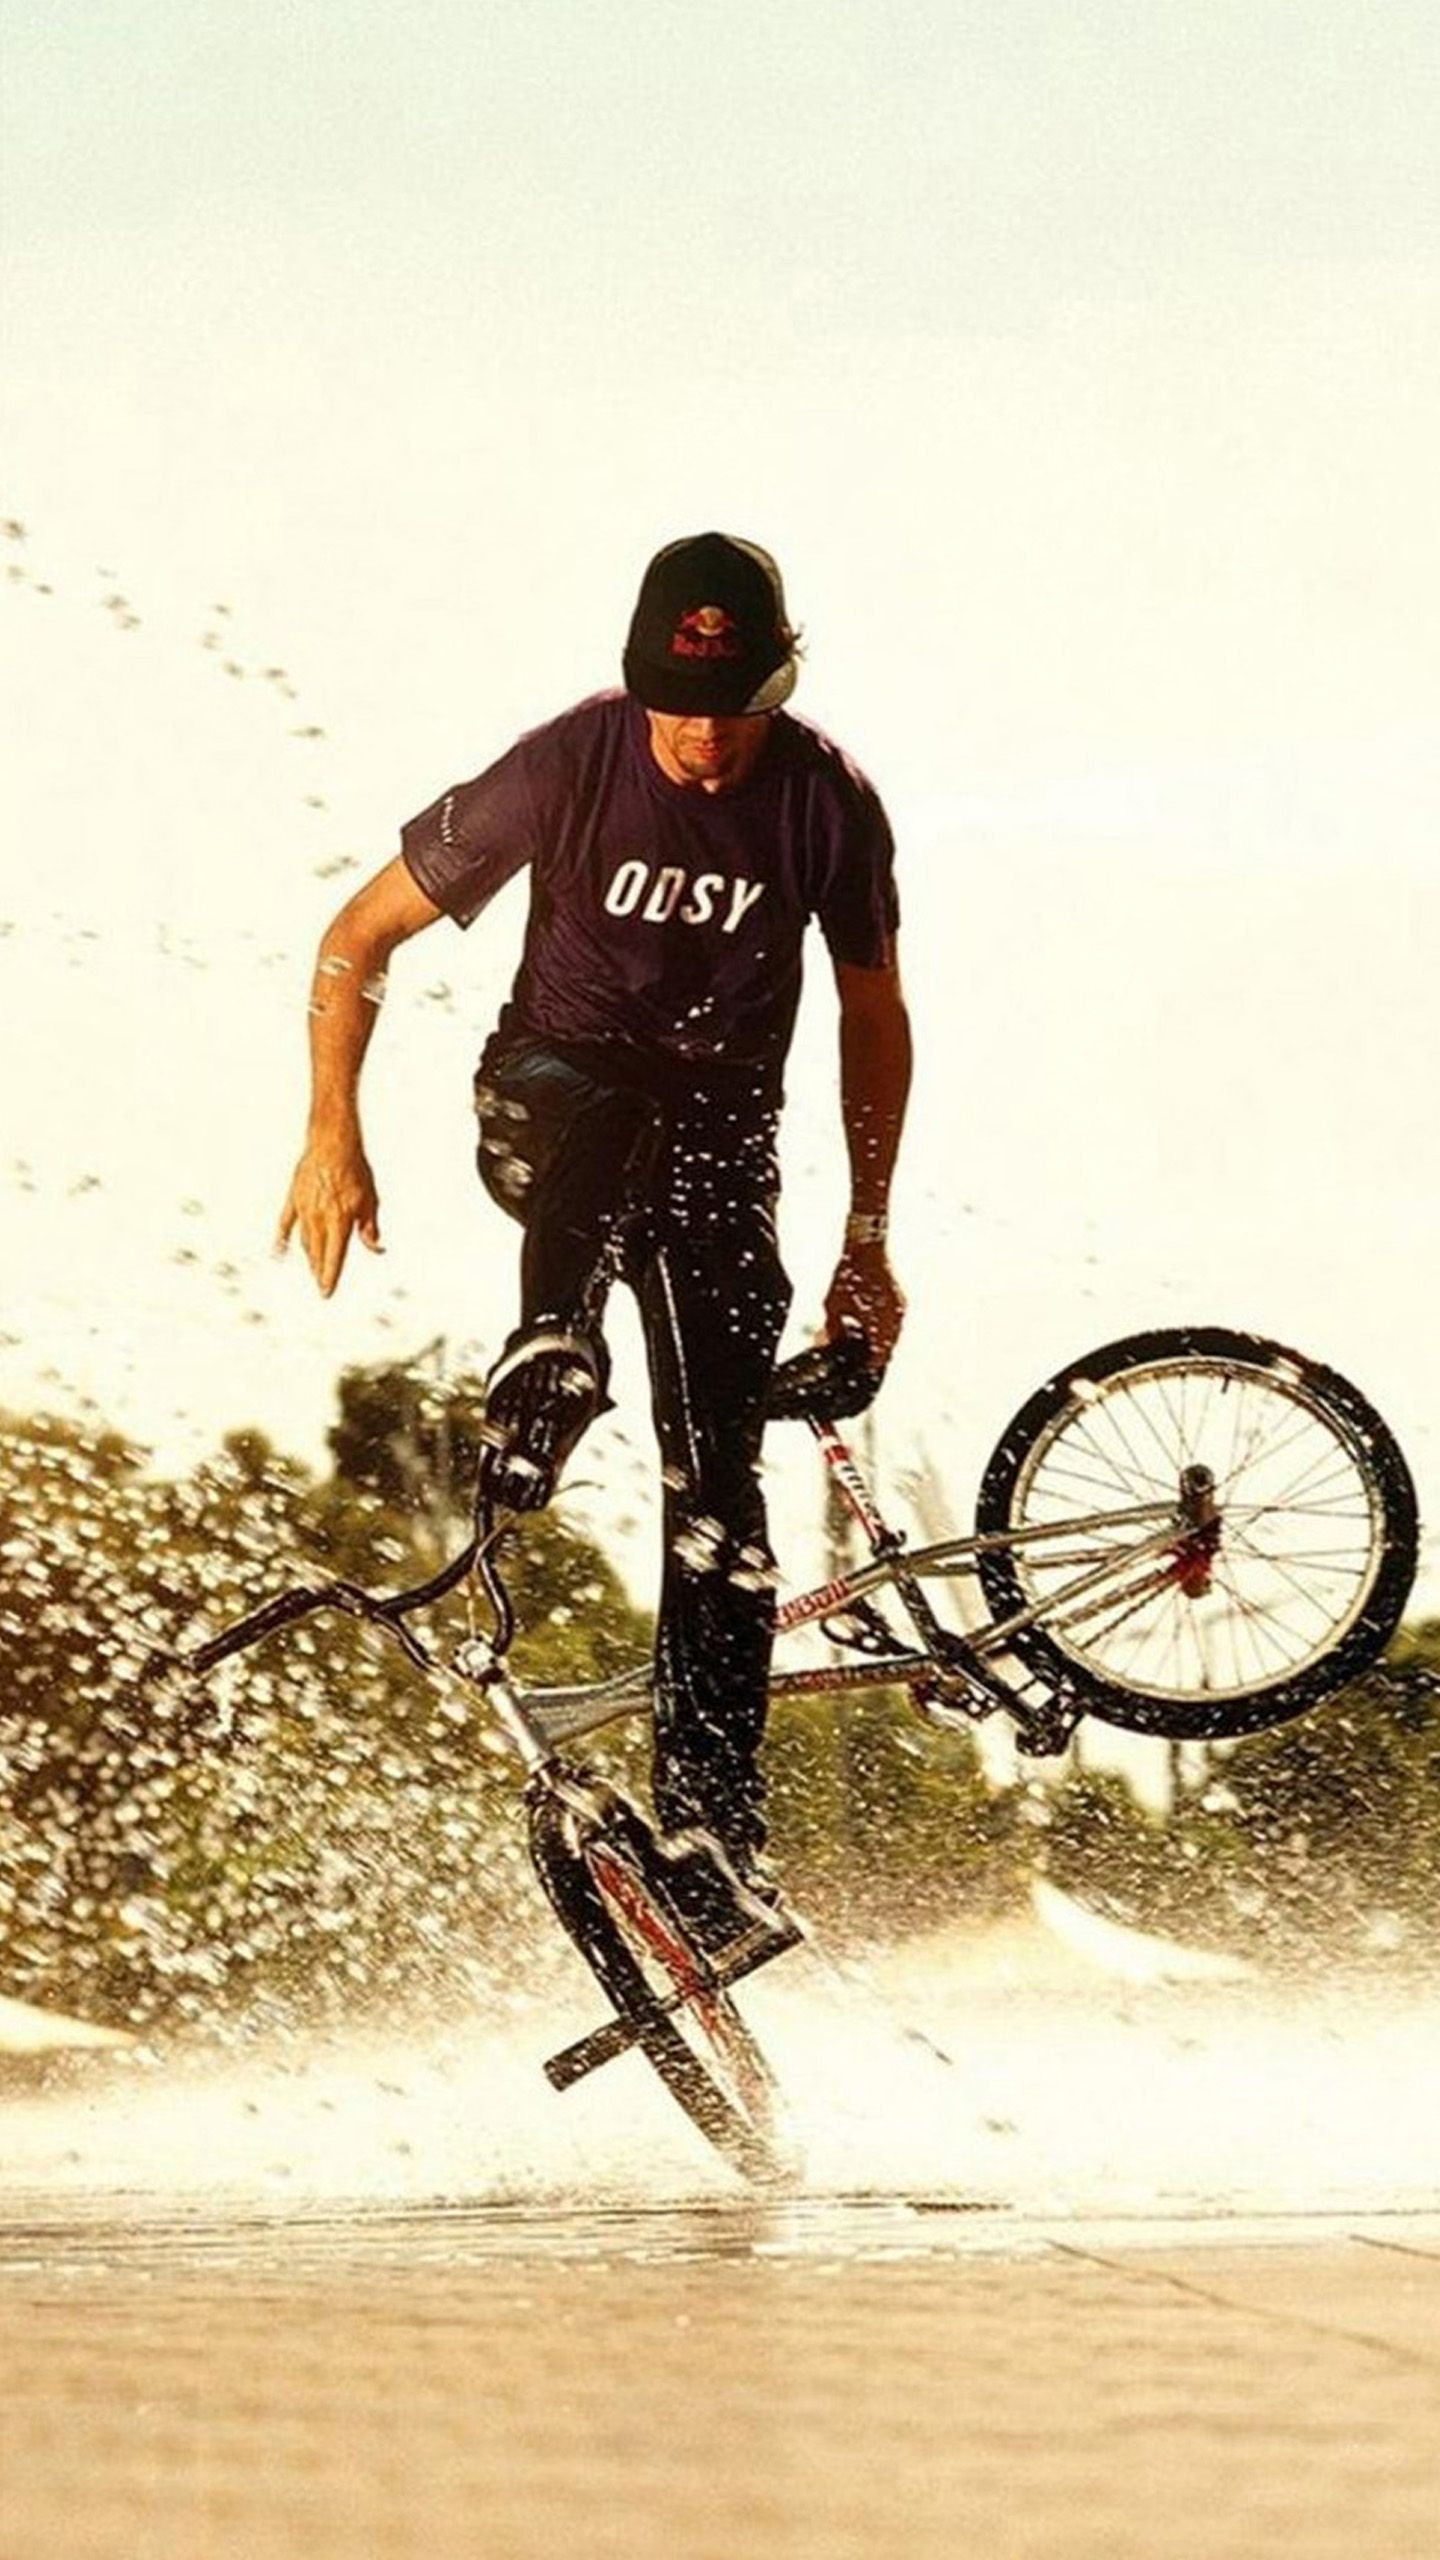 Stunt Bmx Biker Galaxy S6 Wallpaper 1440x2560 Stunt Bmx Bmx Action Photography